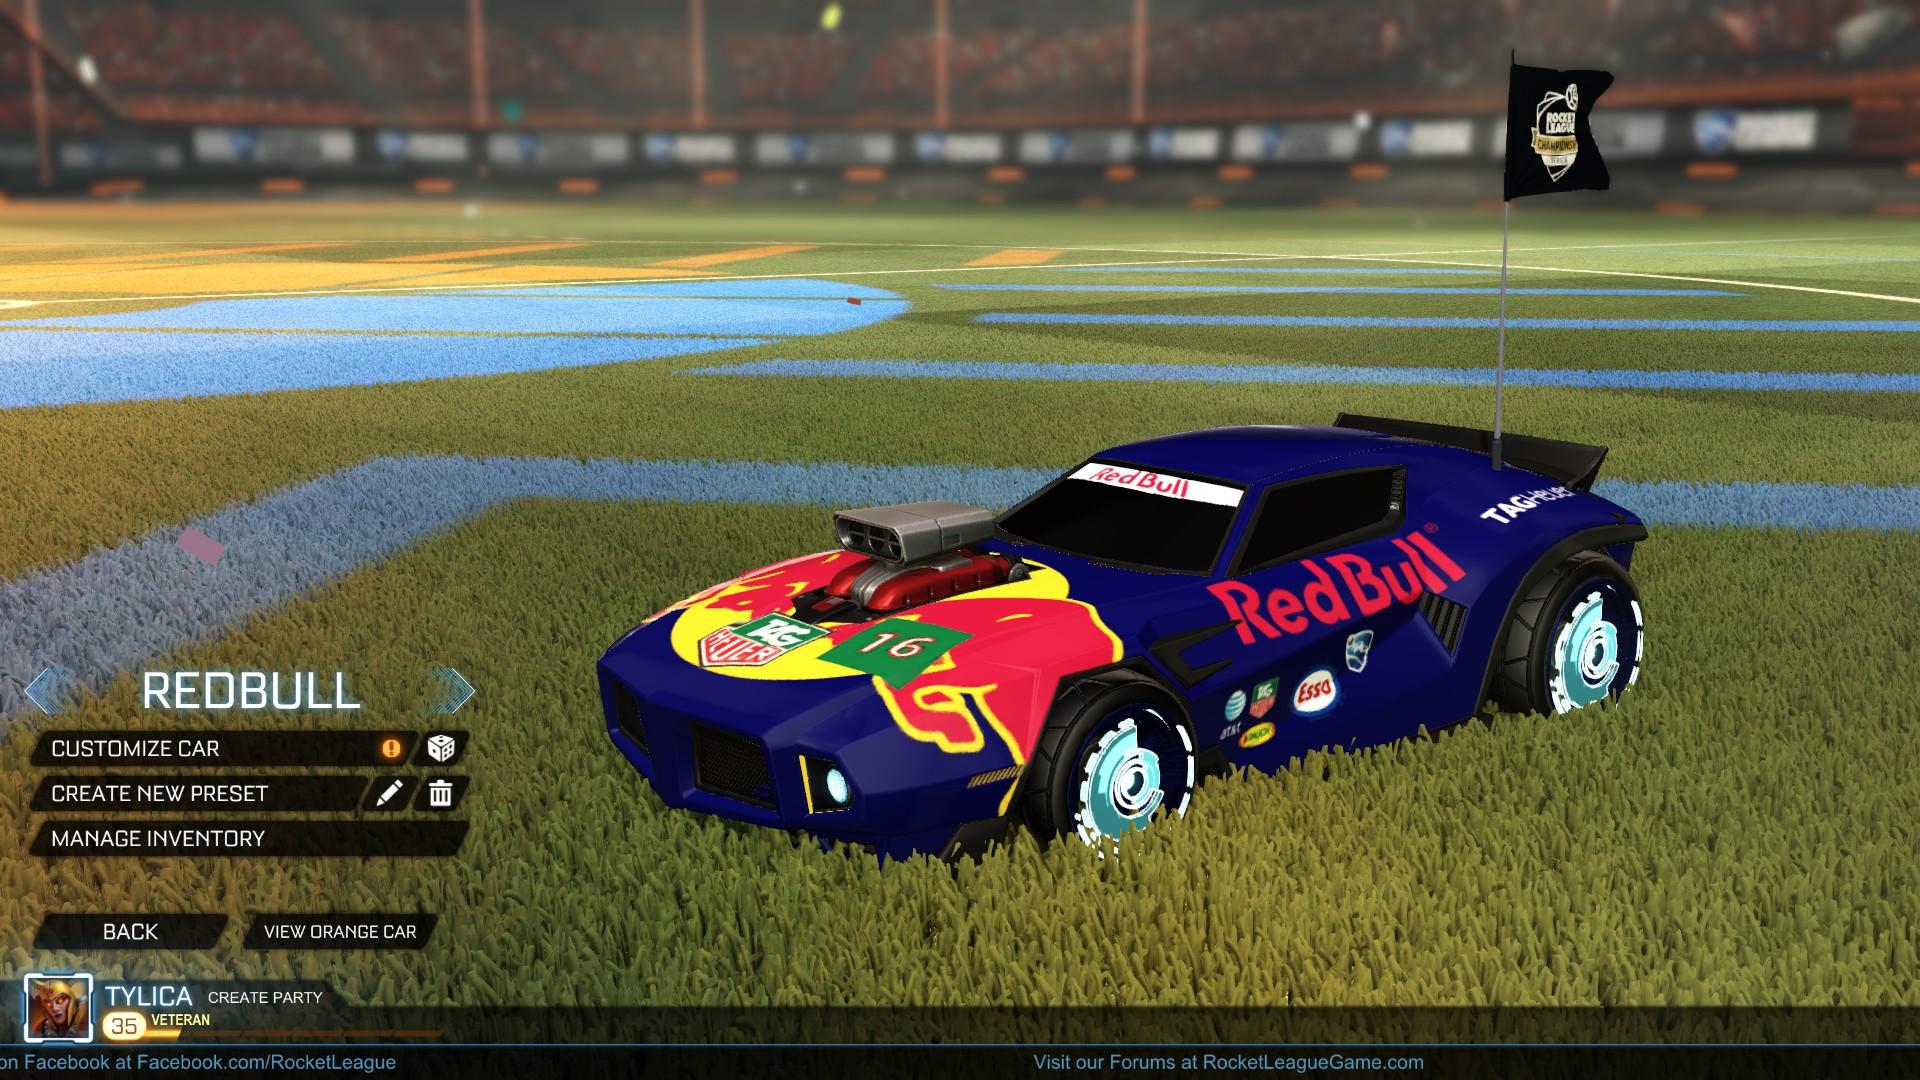 Dominus GT Red Bull Skin